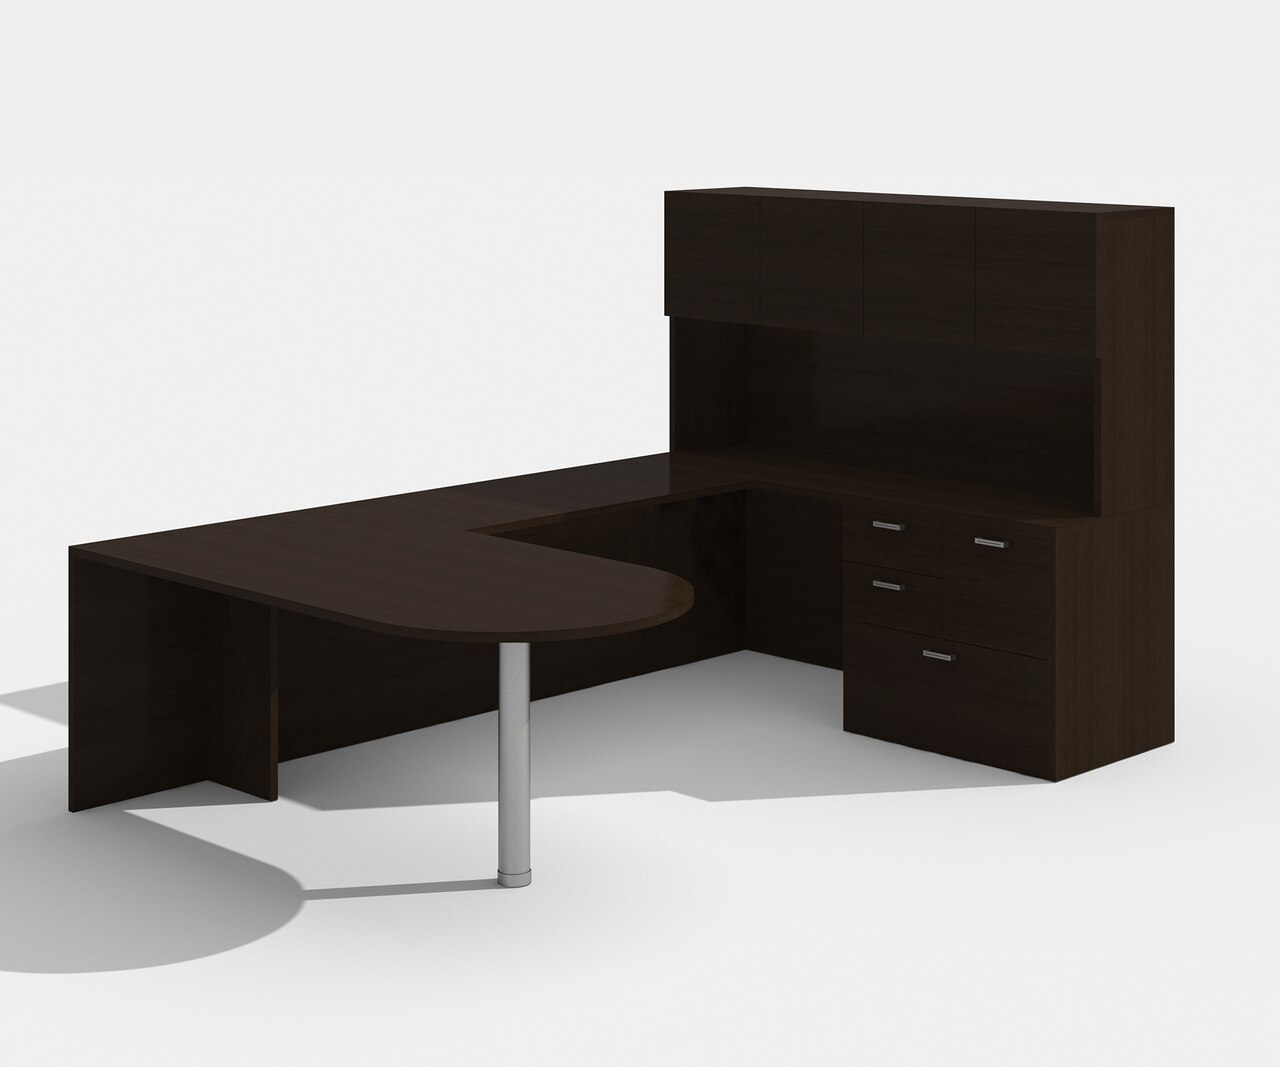 black cherry am-364n amber bullet shape u desk with hutch